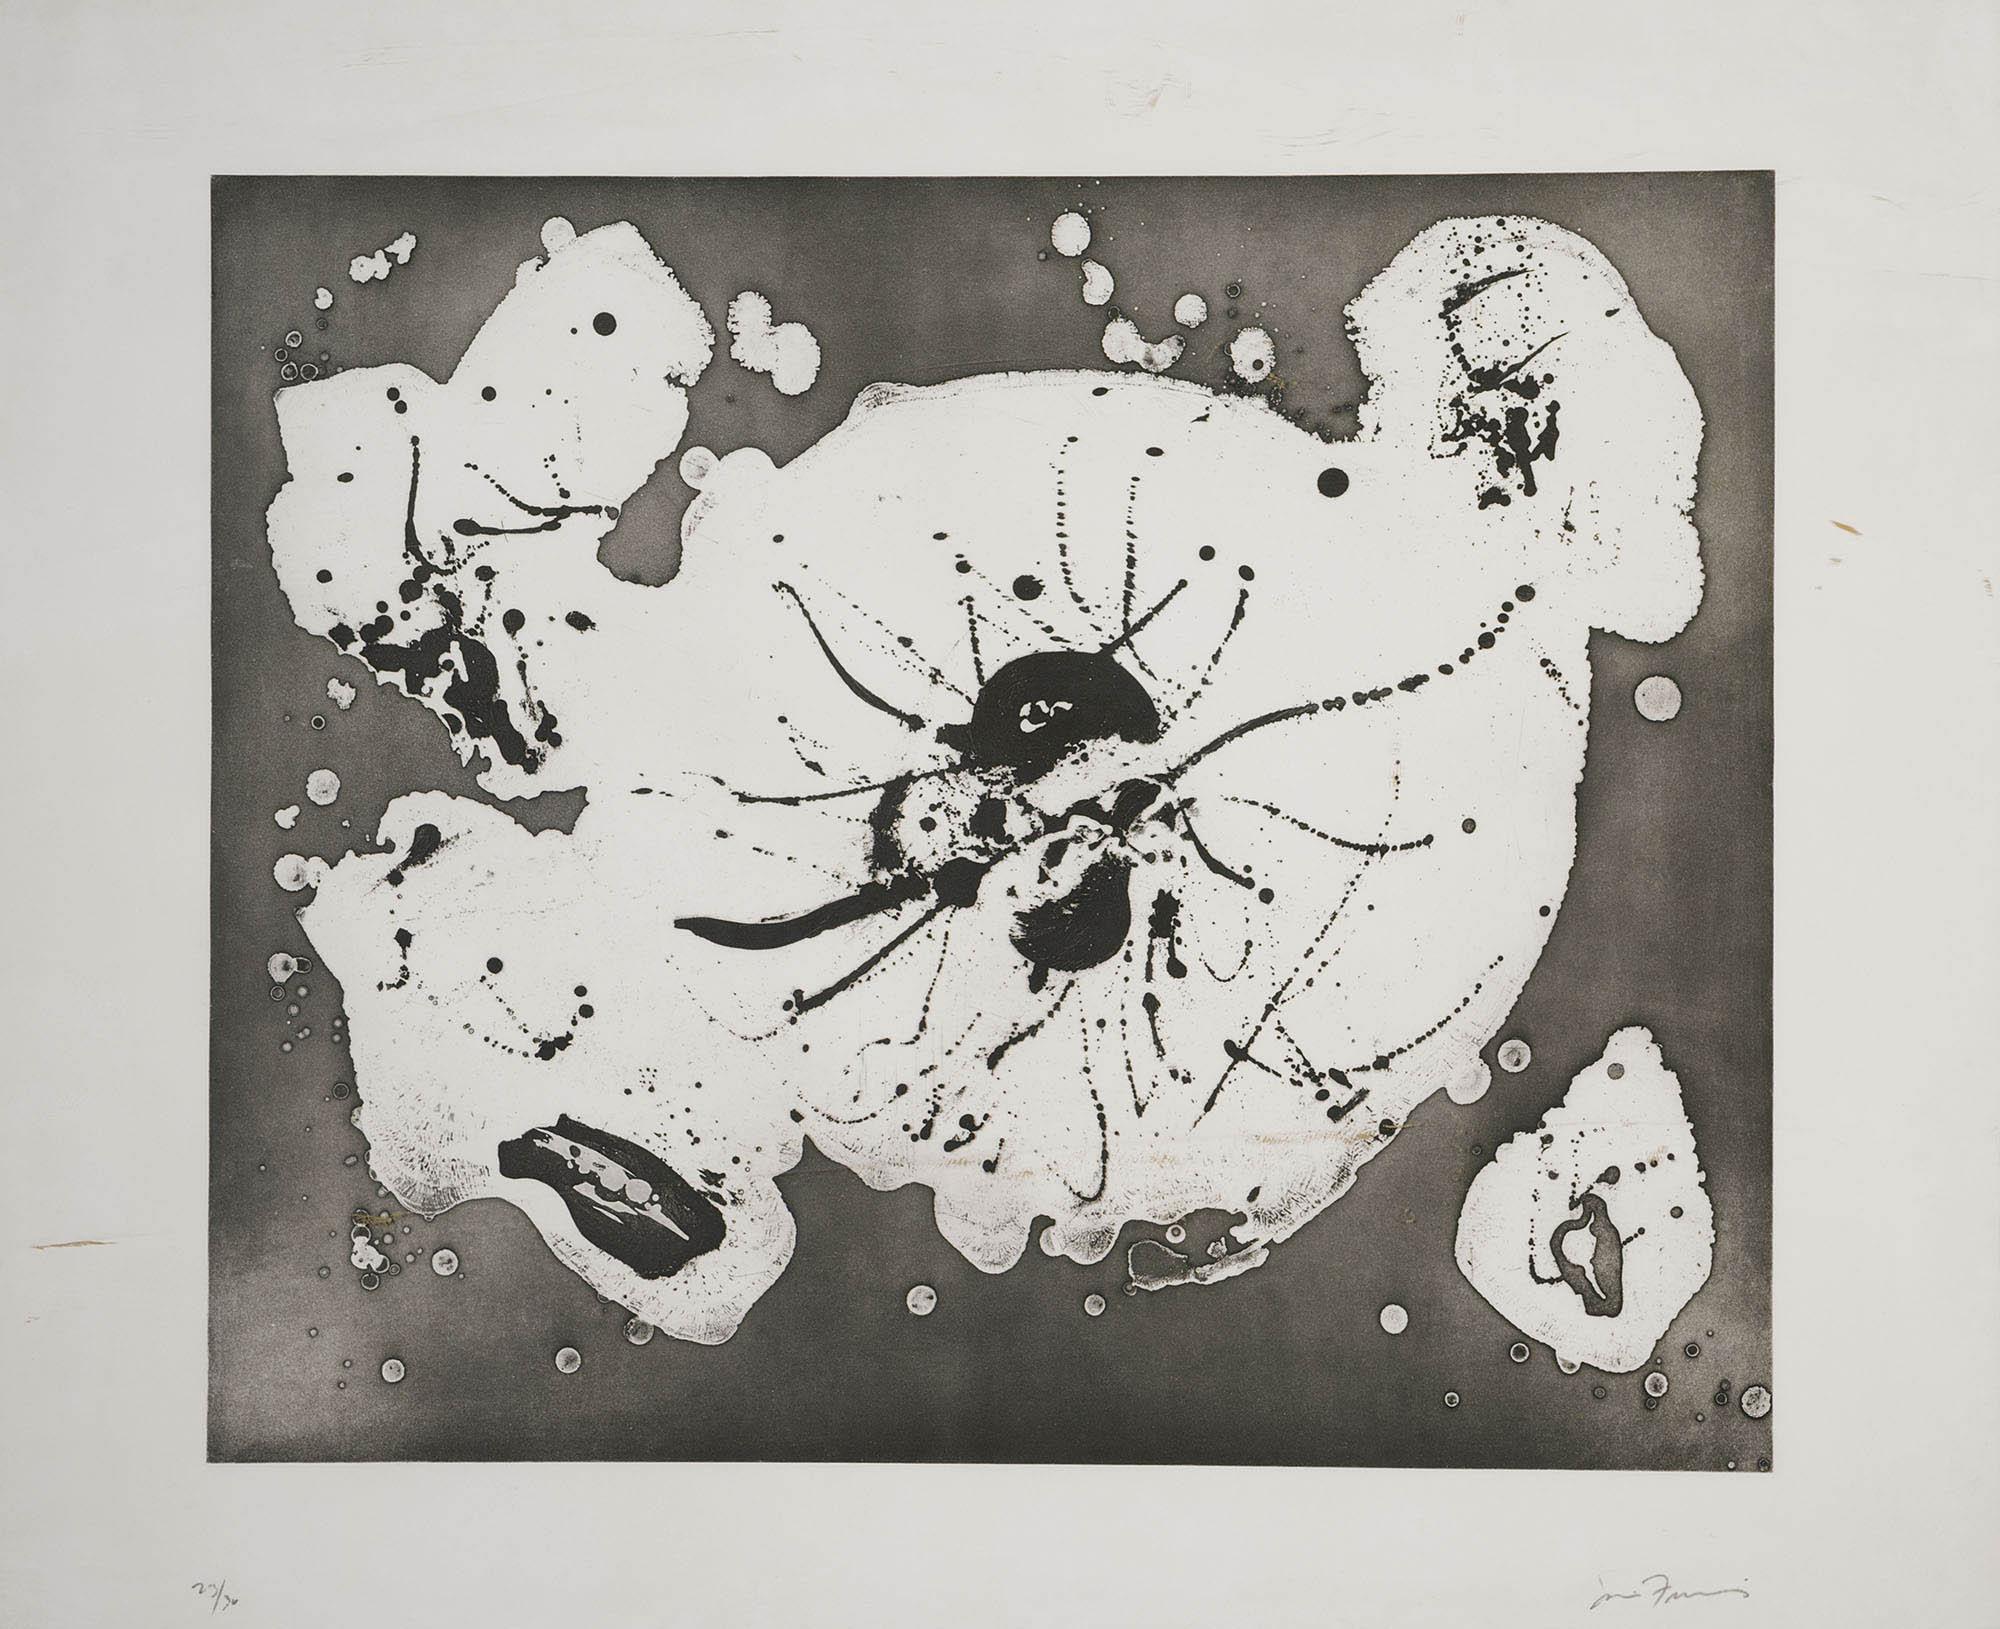 Island plate – H/1, 1973